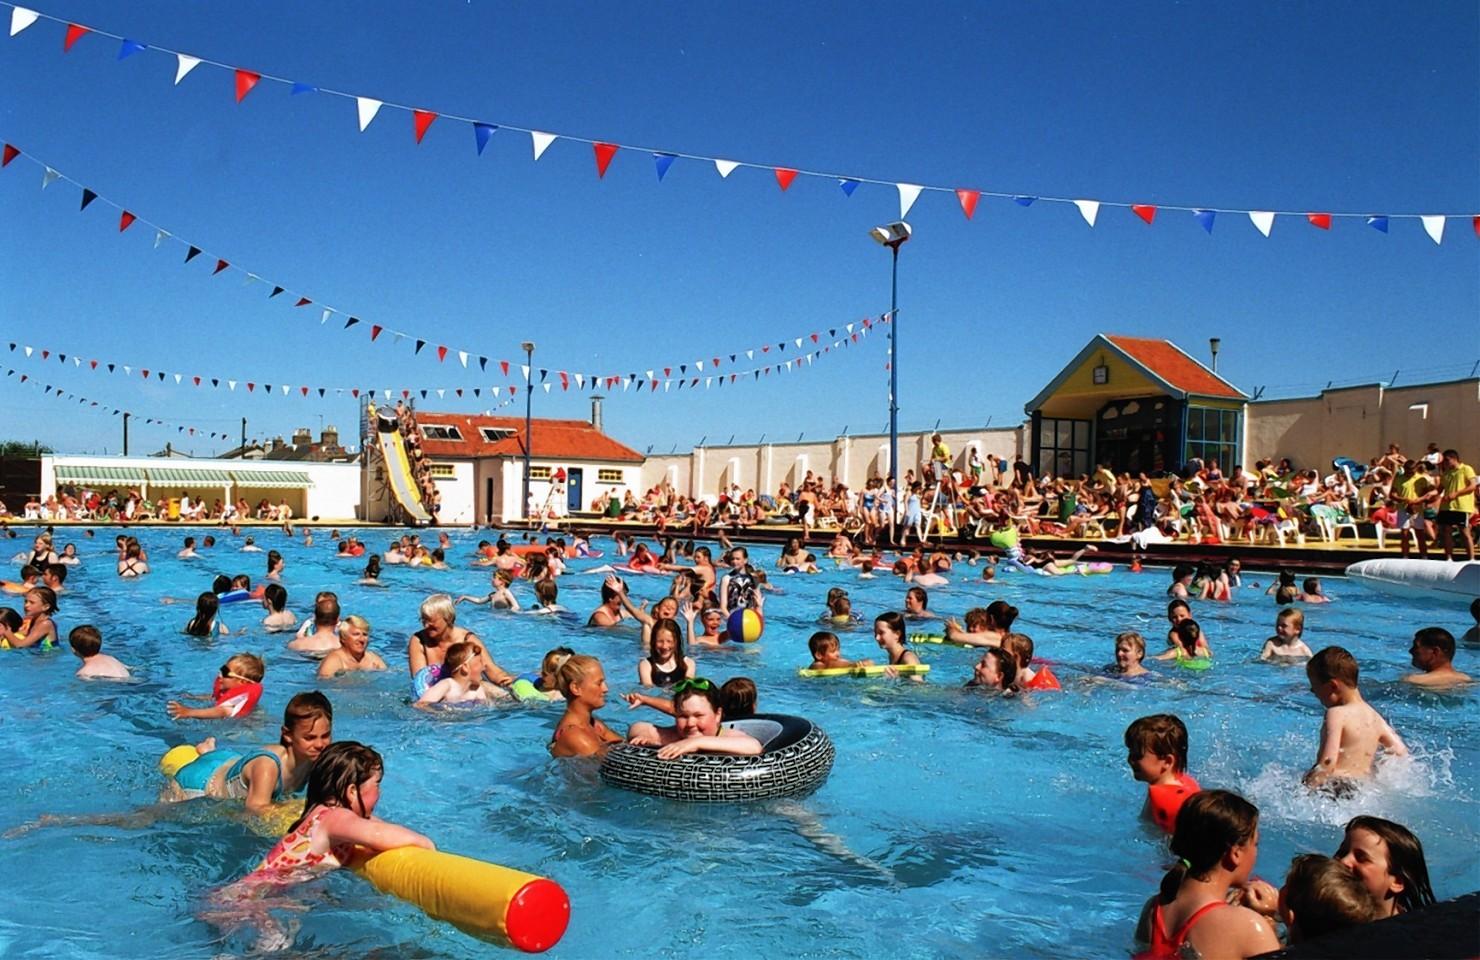 Swimmers enjoying the sun